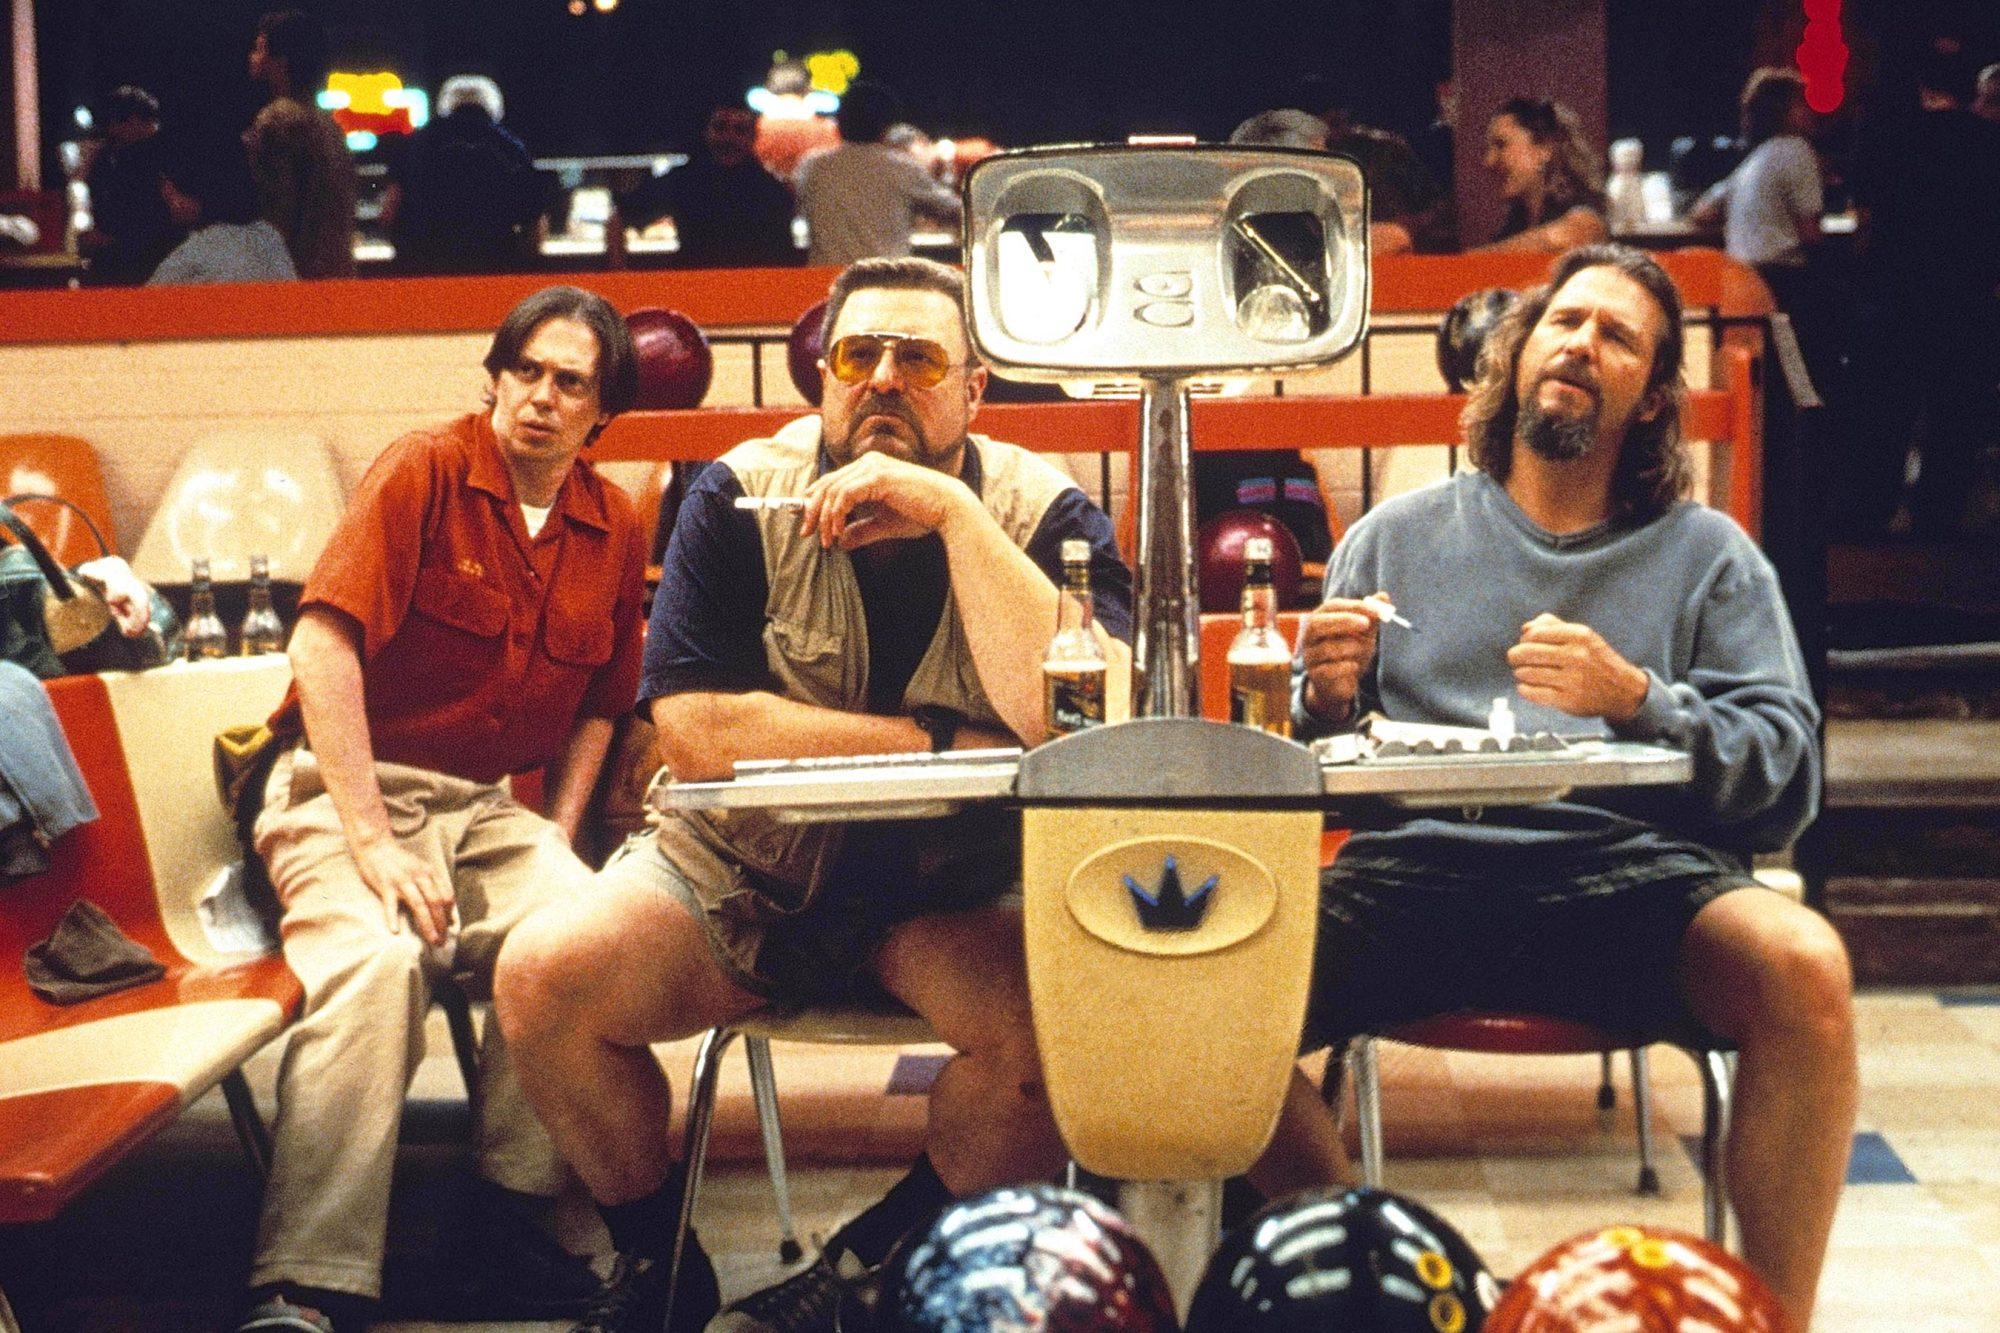 The Big Lebowski - 1998